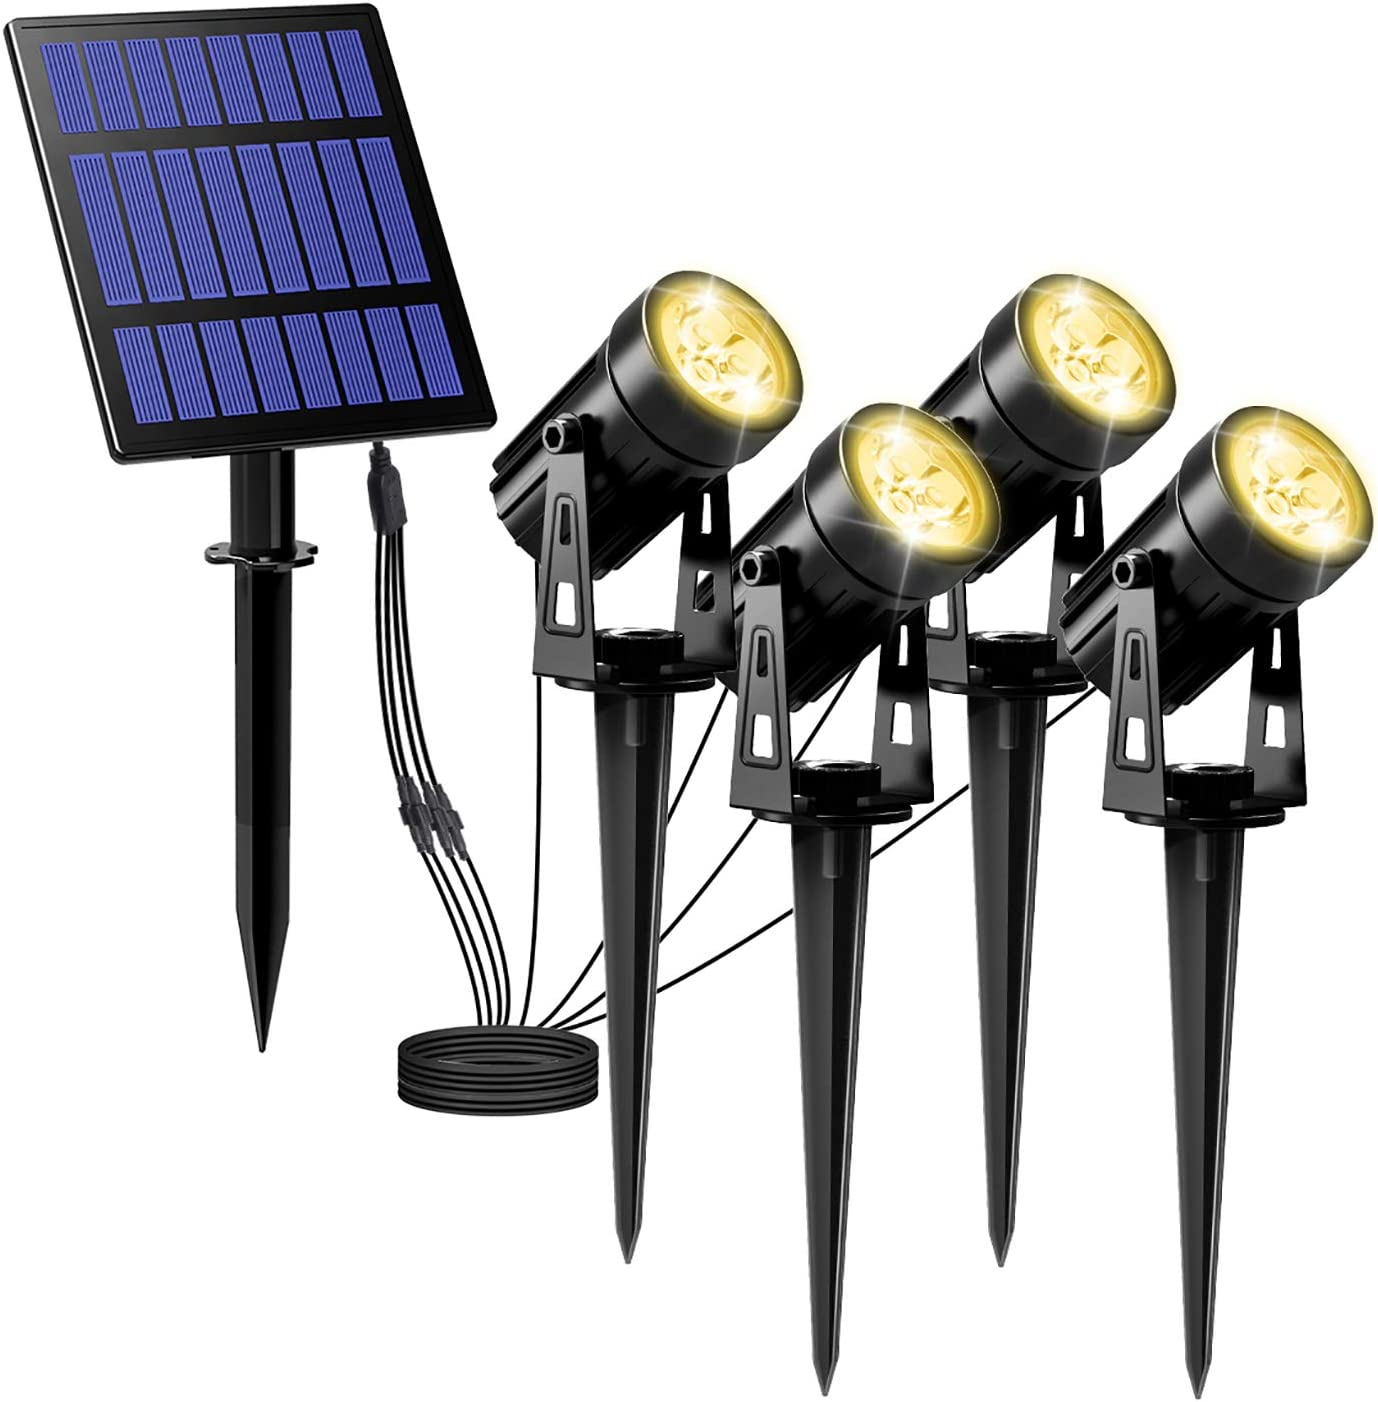 T-SUNUS 3W Solar Spotlights, IP65 Waterproof Outdoor Solar Lights Landscape Lighting Wall Light Auto On/Off with 4 Warm White Spot Lamp for Tree,Patio, Yard, Garden